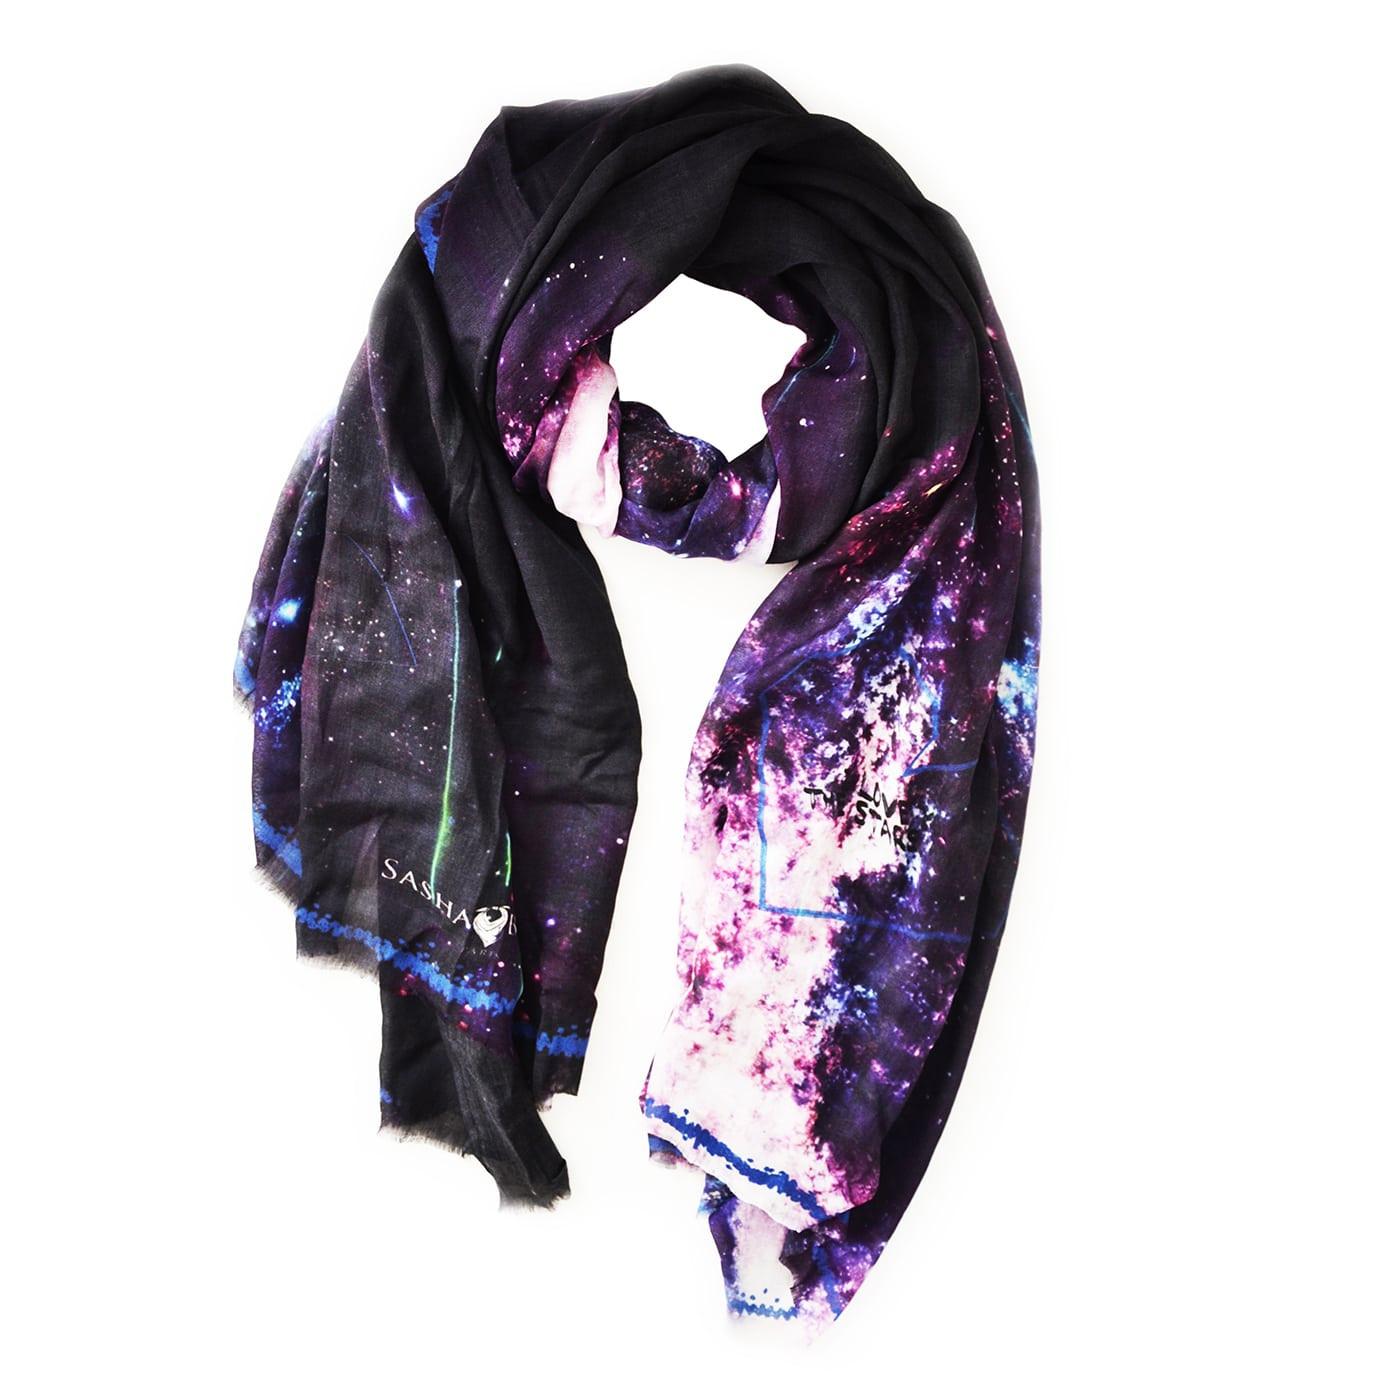 Echarpe modal cachemire GALAXY-violet